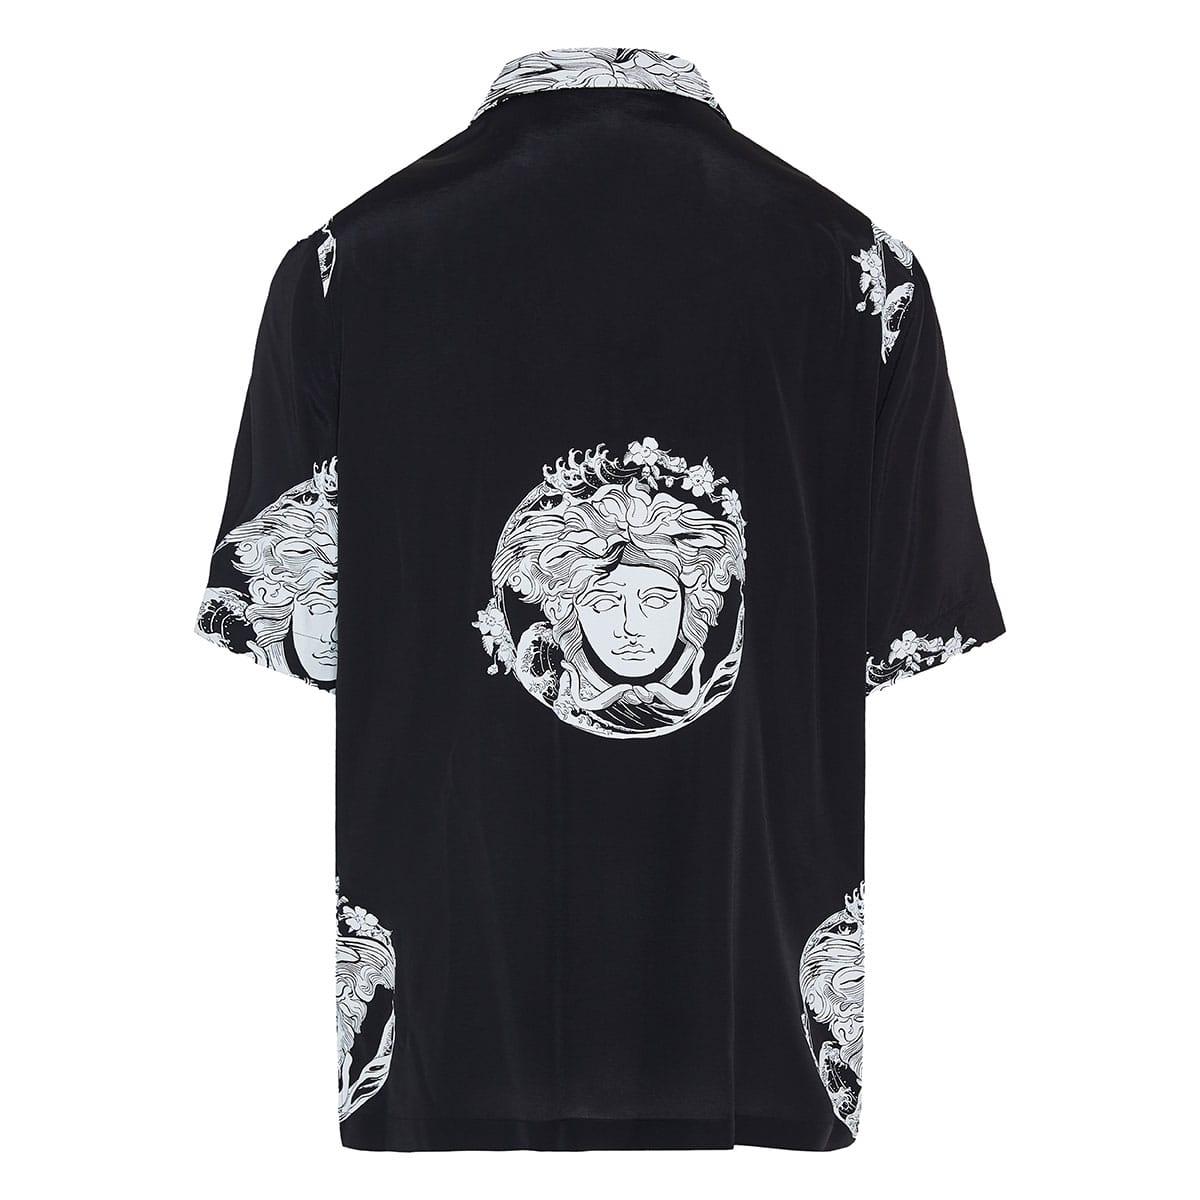 Medusa-printed shirt